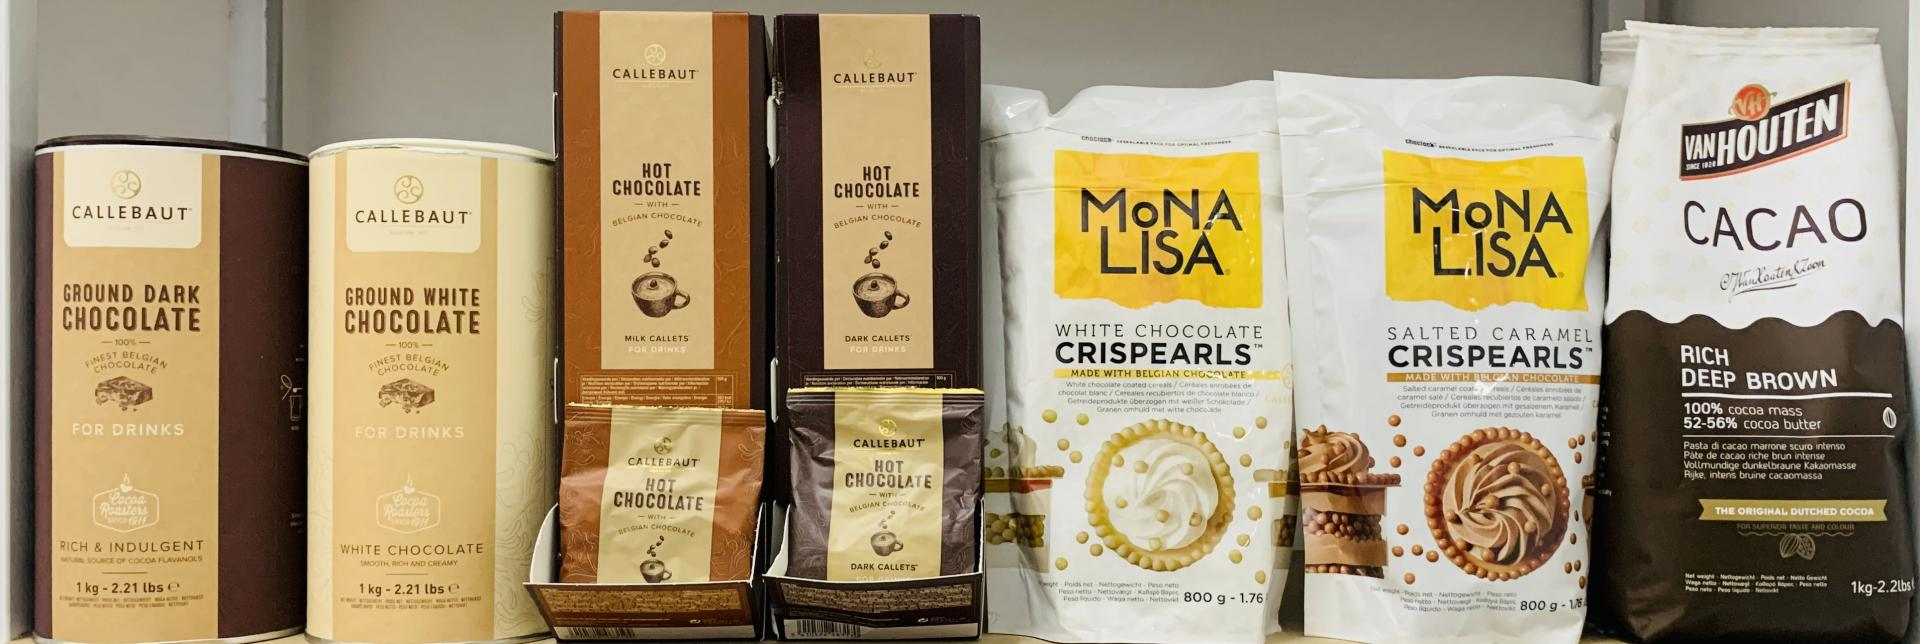 Produits callebaut